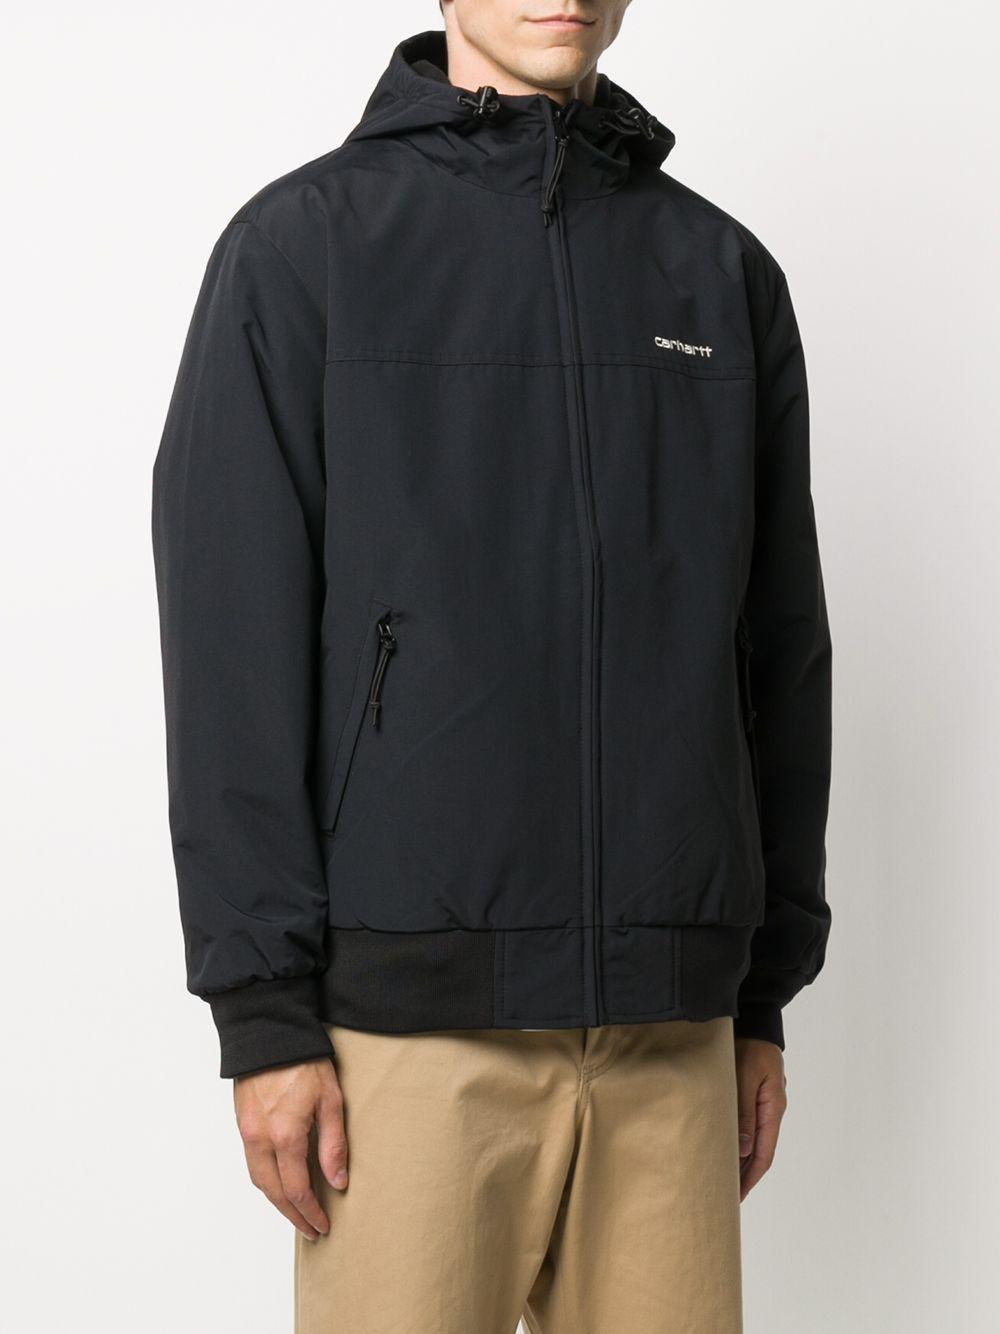 hoodie jacket man black CARHARTT WIP | Jackets | I0284360D2.XX